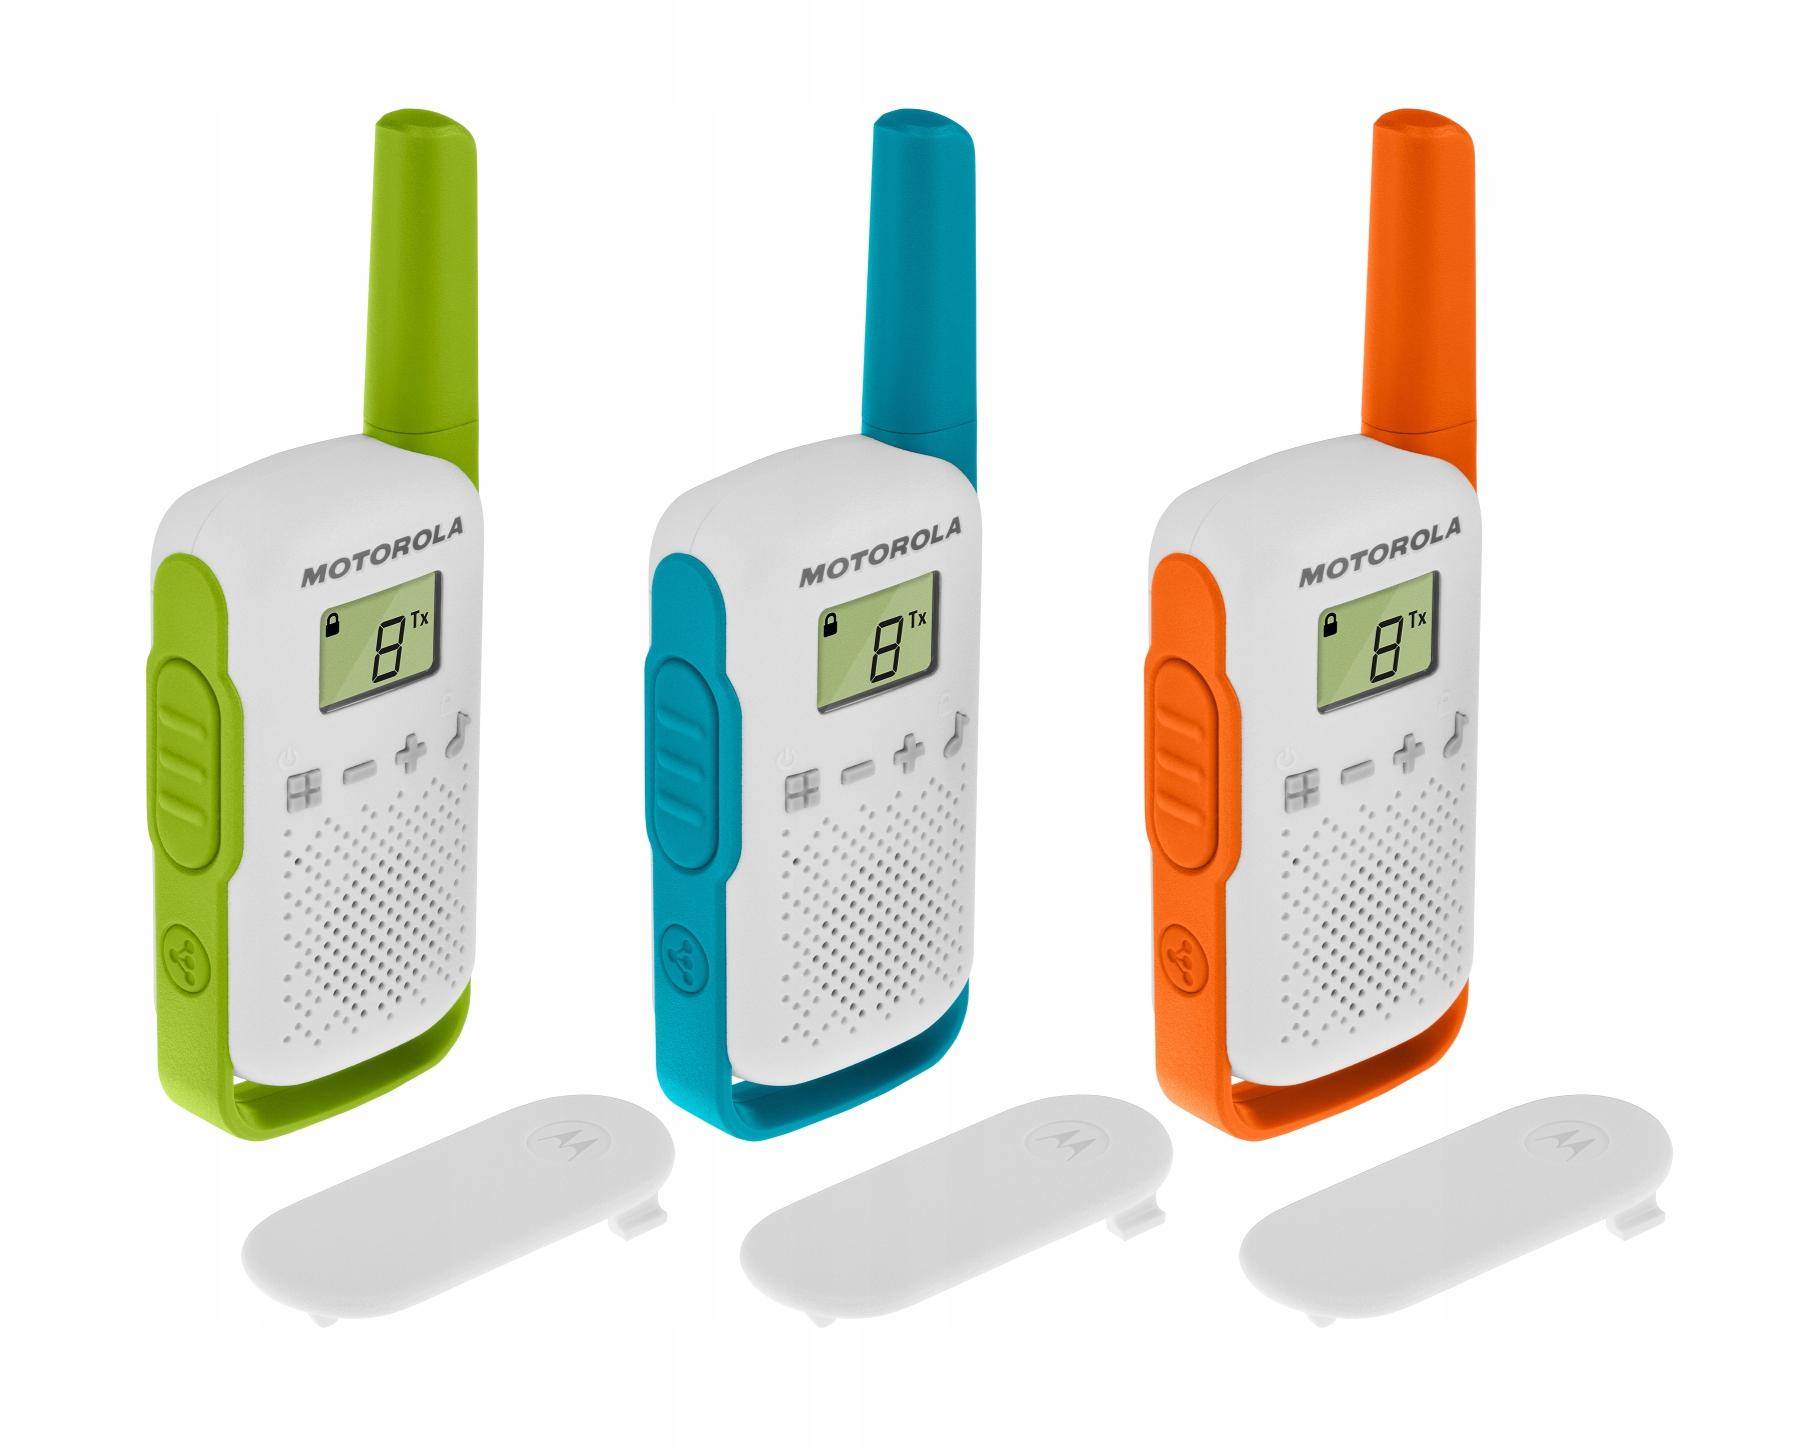 Item MOTOROLA T42 [3 walkie-talkie walkie-talkie]